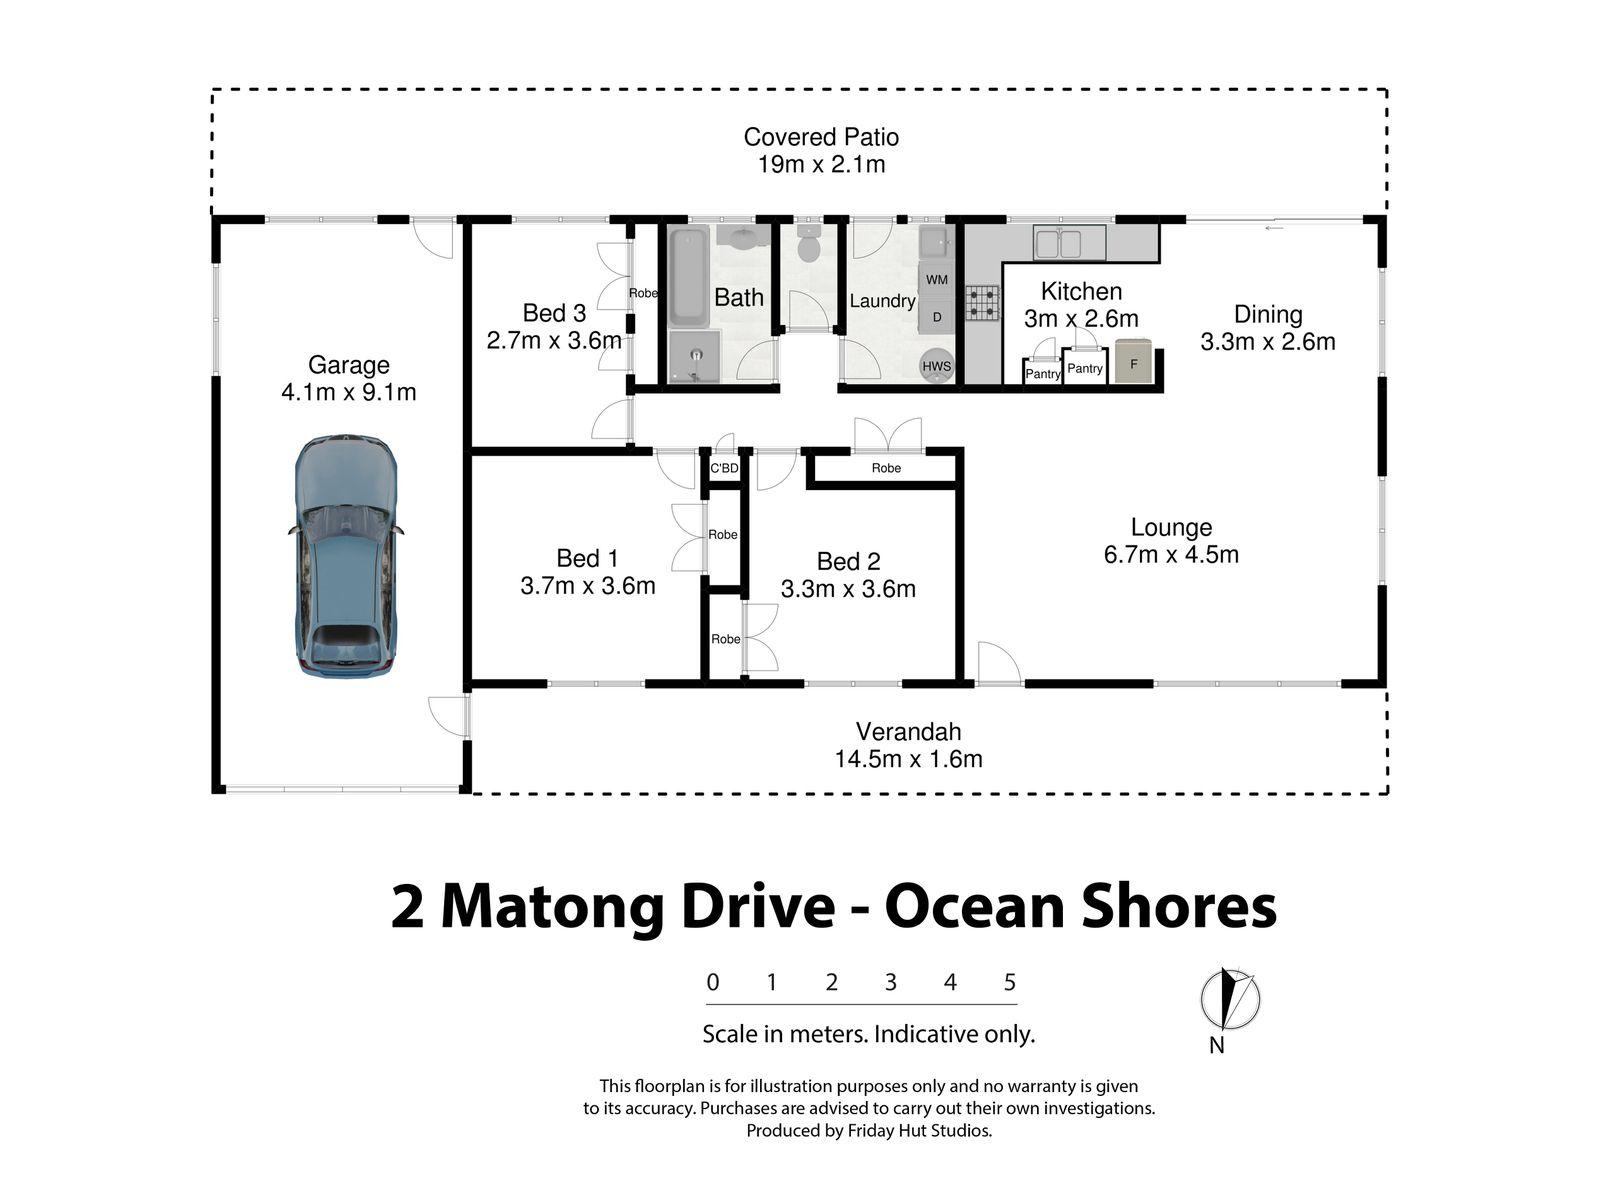 2 Matong Drive, Ocean Shores